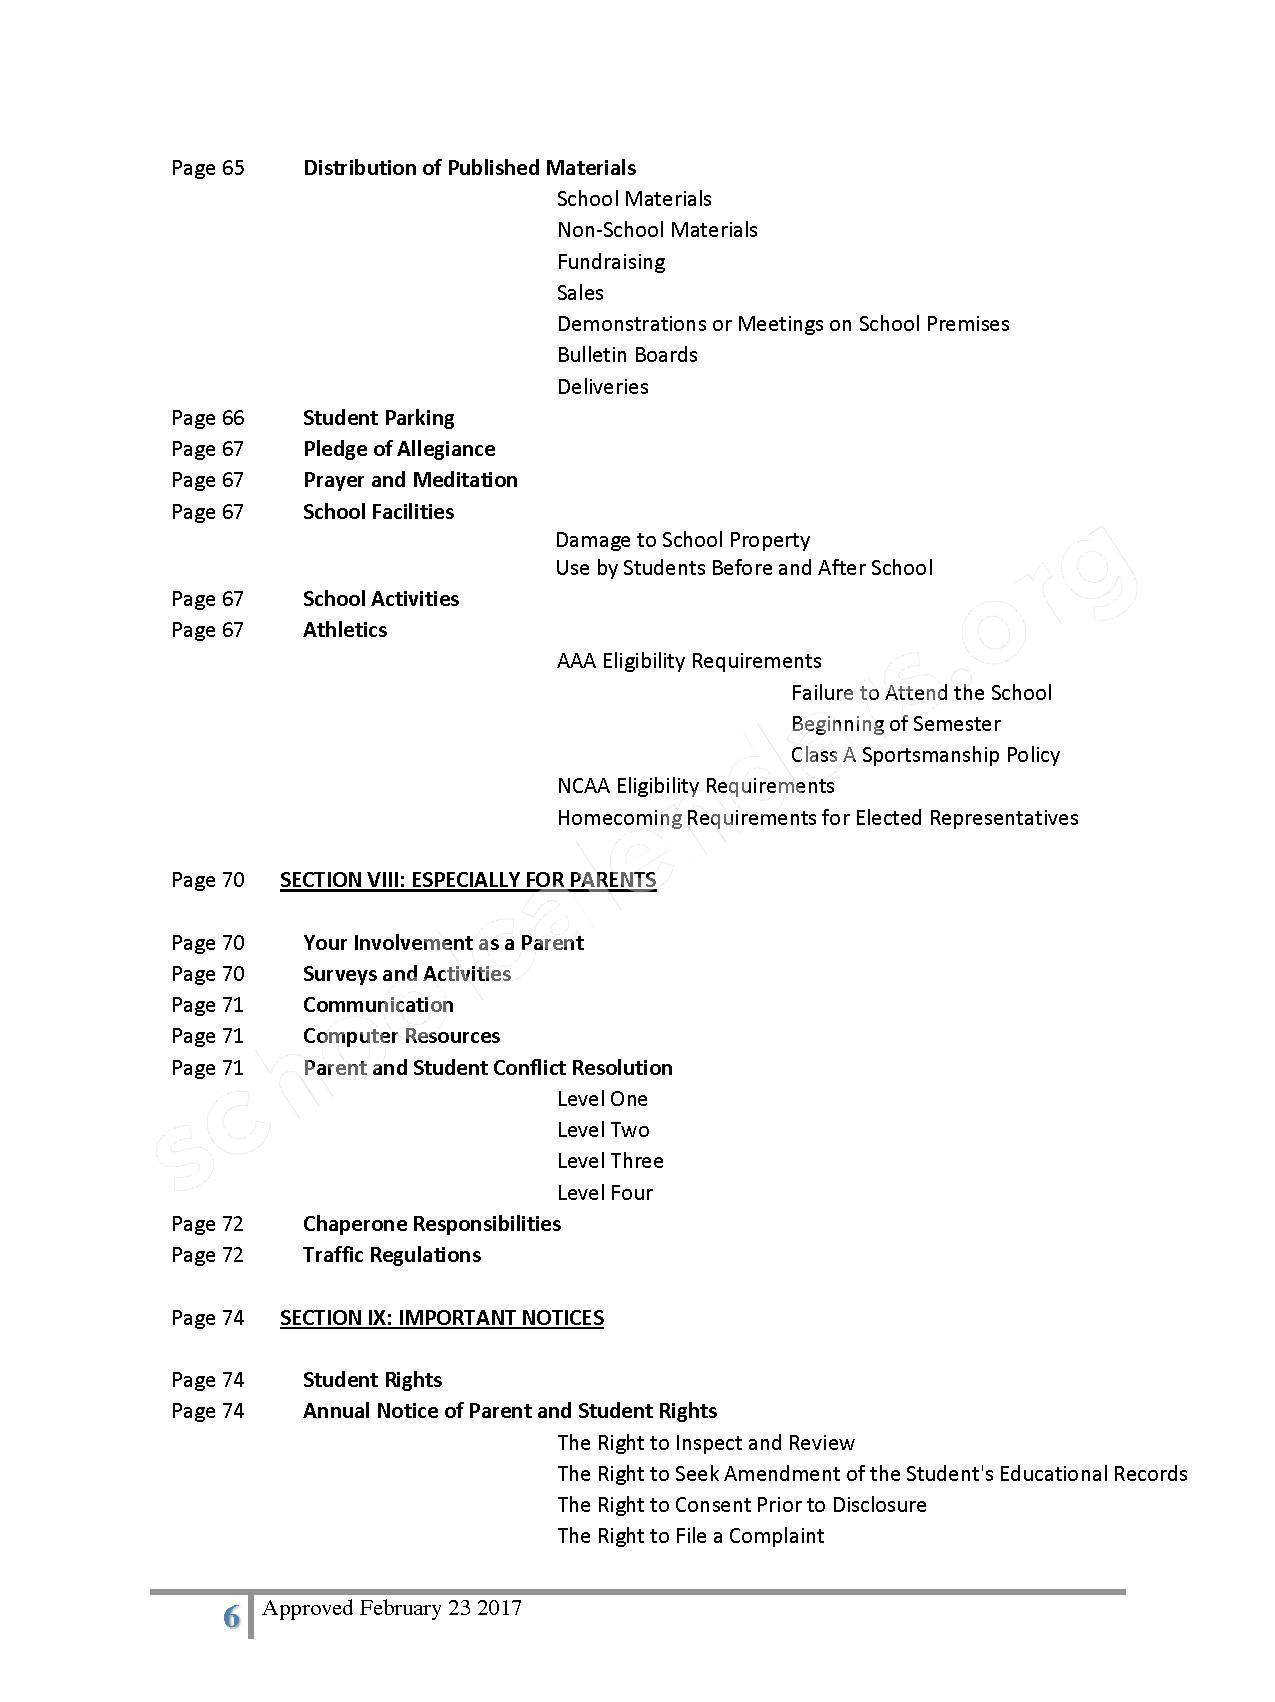 2016 - 2017 District Calendar – Lisa Academy Public Charter Schools – page 6